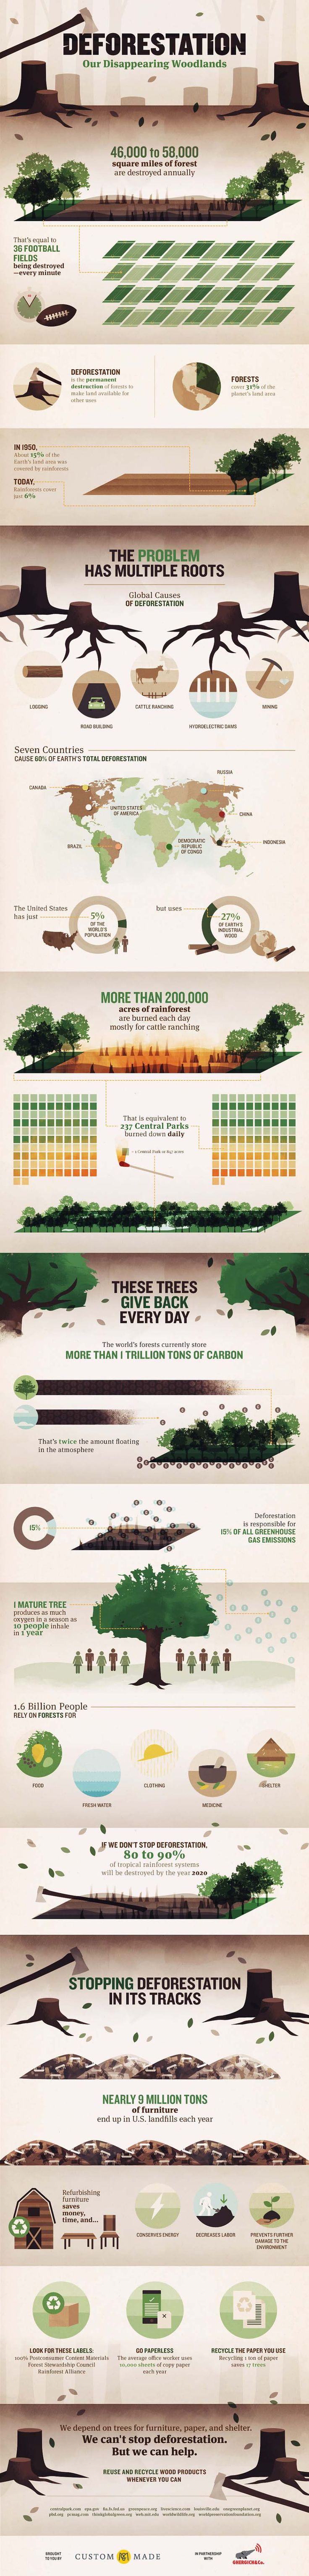 04e7bfe989bc9241b0e20c5ed652c4ca--deforestation-facts-deforestation-for-kids Frais De Haie De Jardin Concept